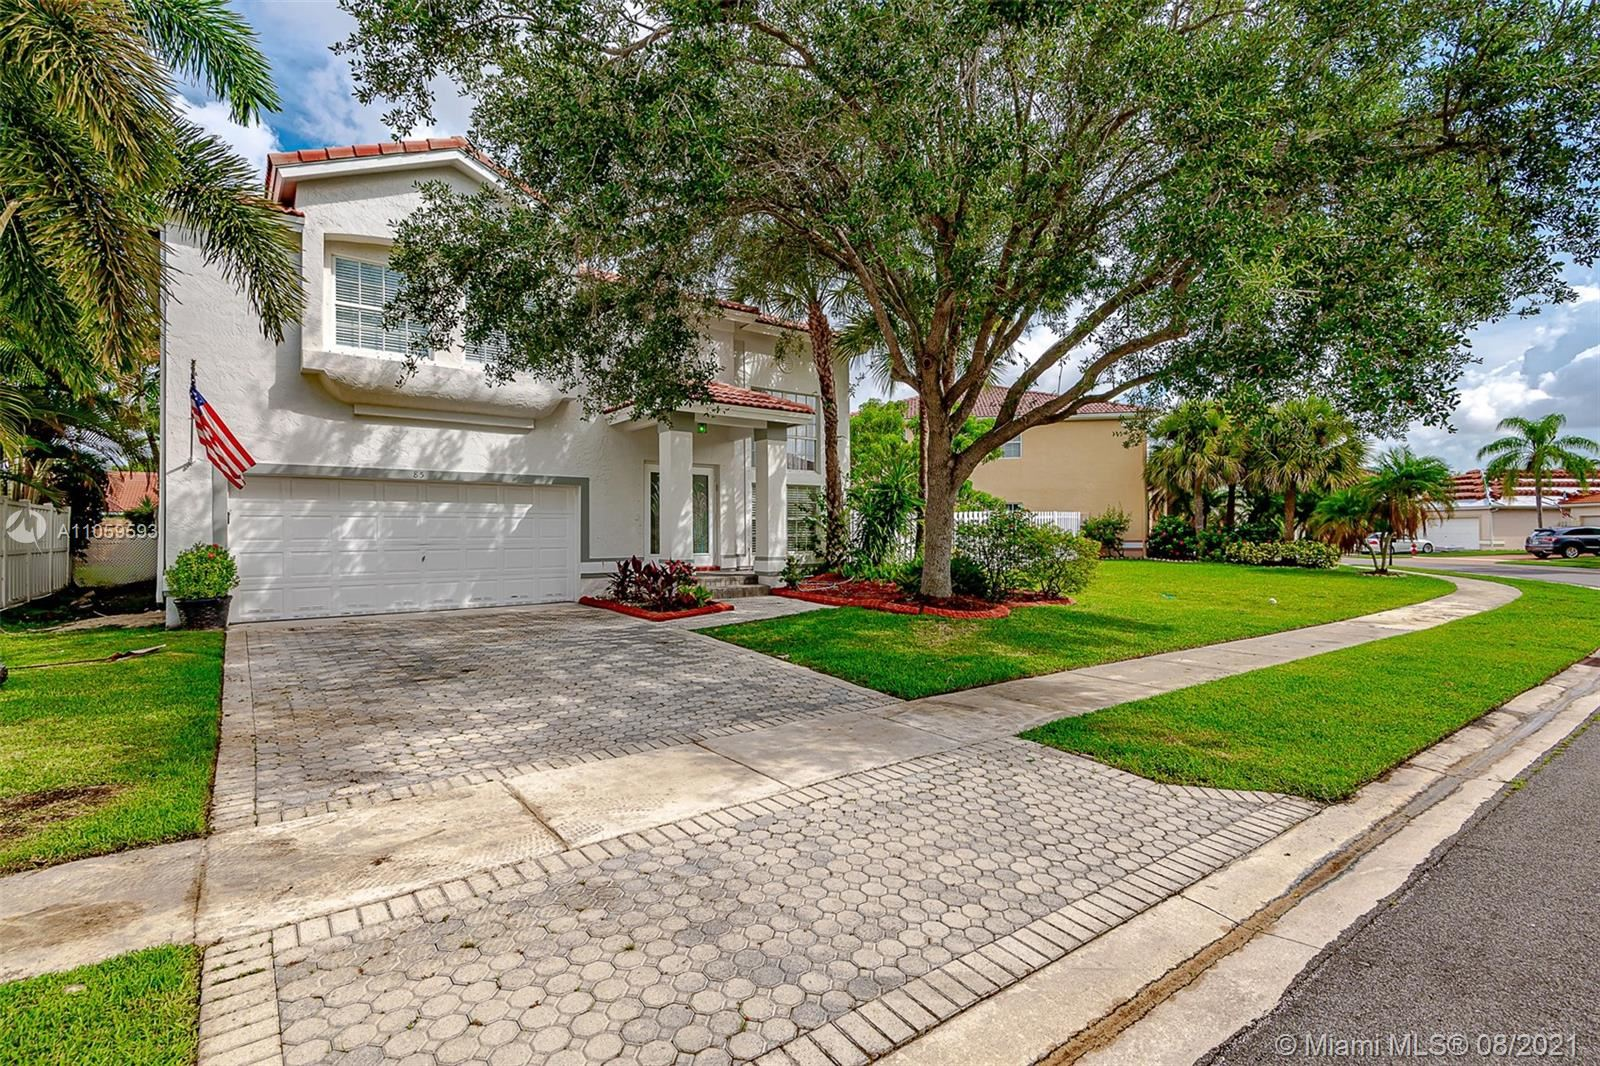 85 Gables Blvd, Weston, FL 33326 - #: A11059593